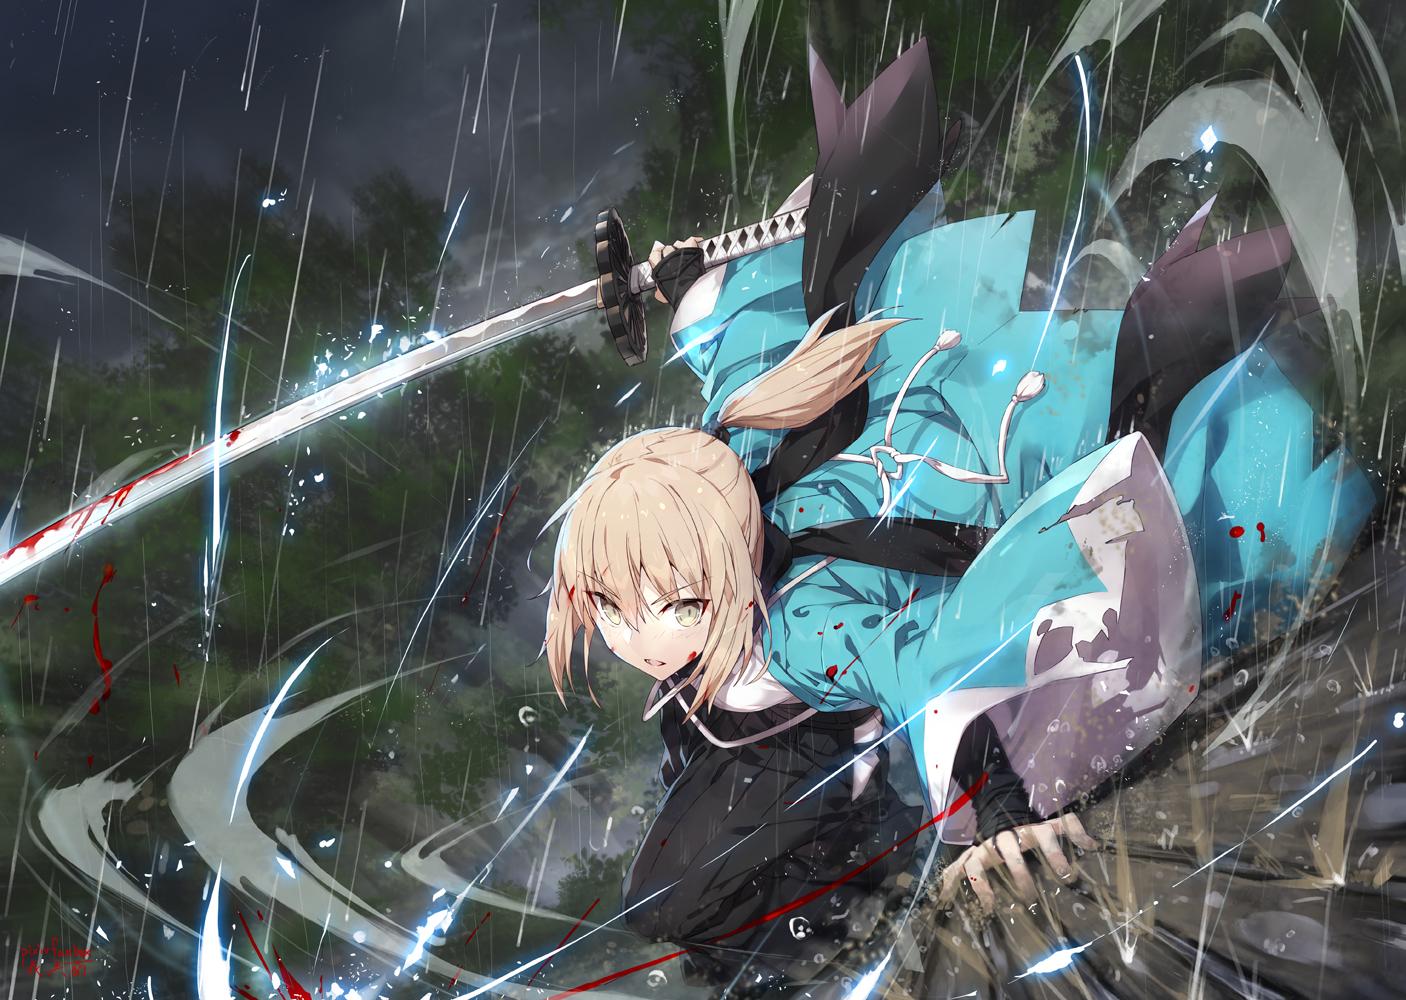 blonde_hair blood fate/grand_order fate_(series) gabiran japanese_clothes okita_souji_(fate) orange_eyes ponytail rain signed sword water weapon